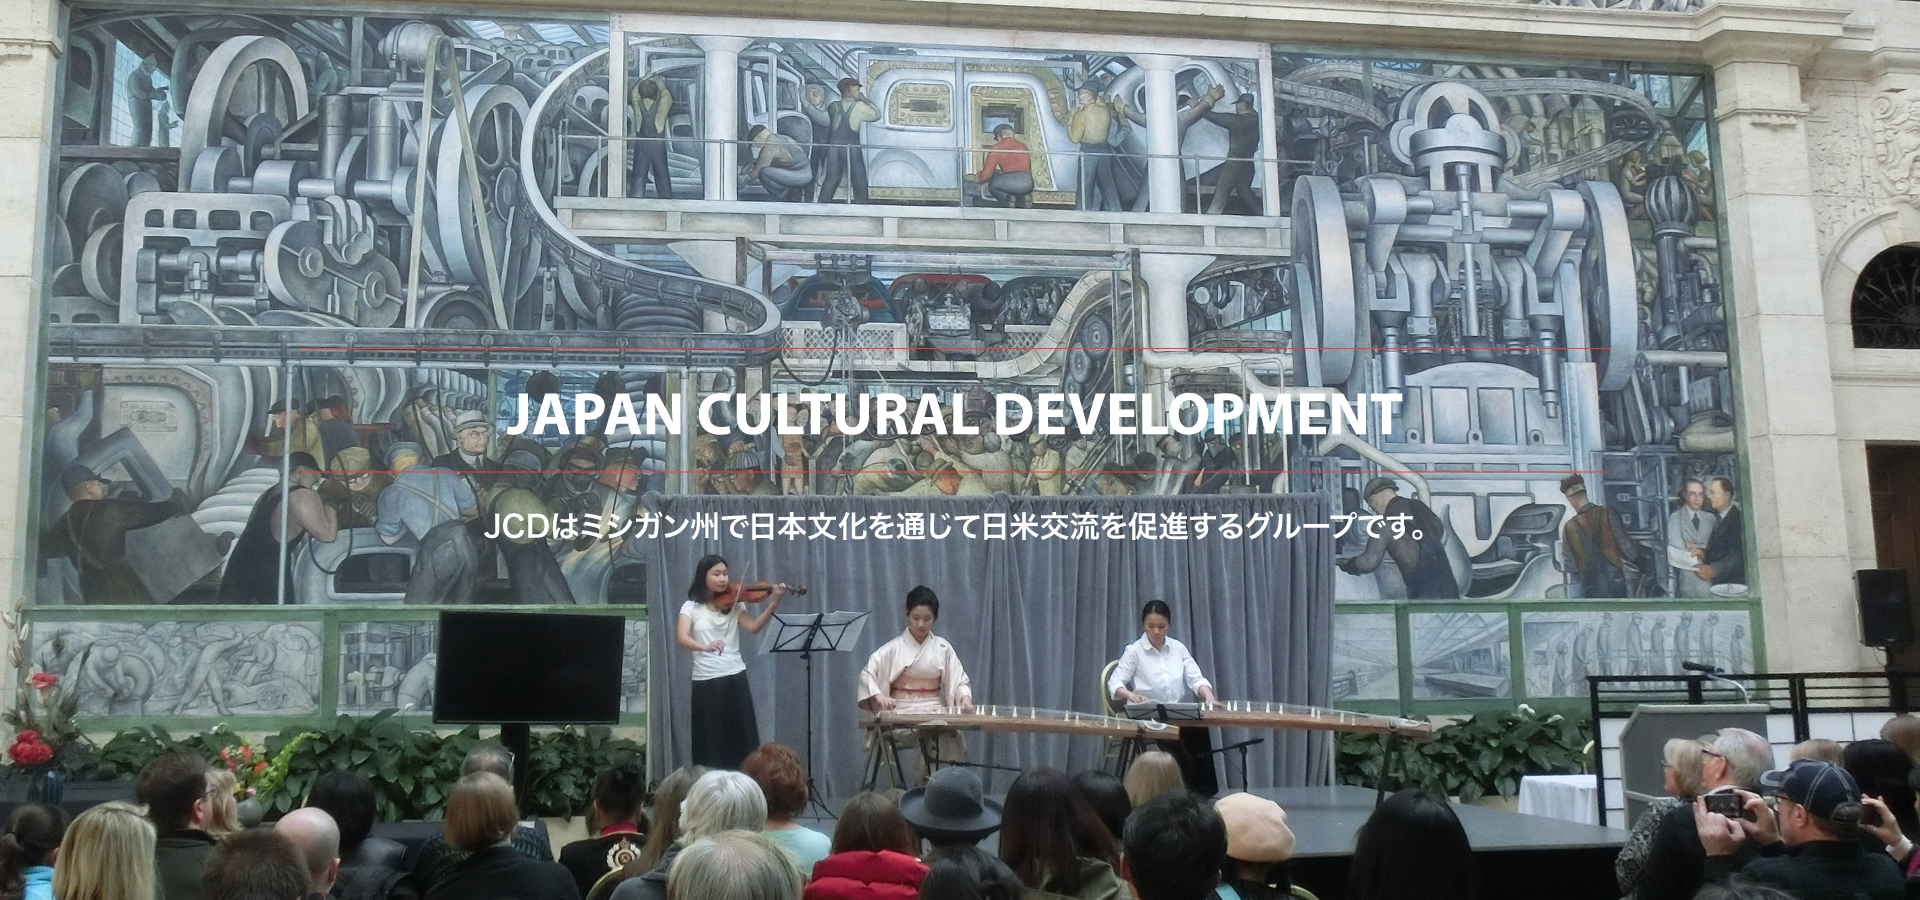 JAPAN CULTURAL DEVELOPMENT